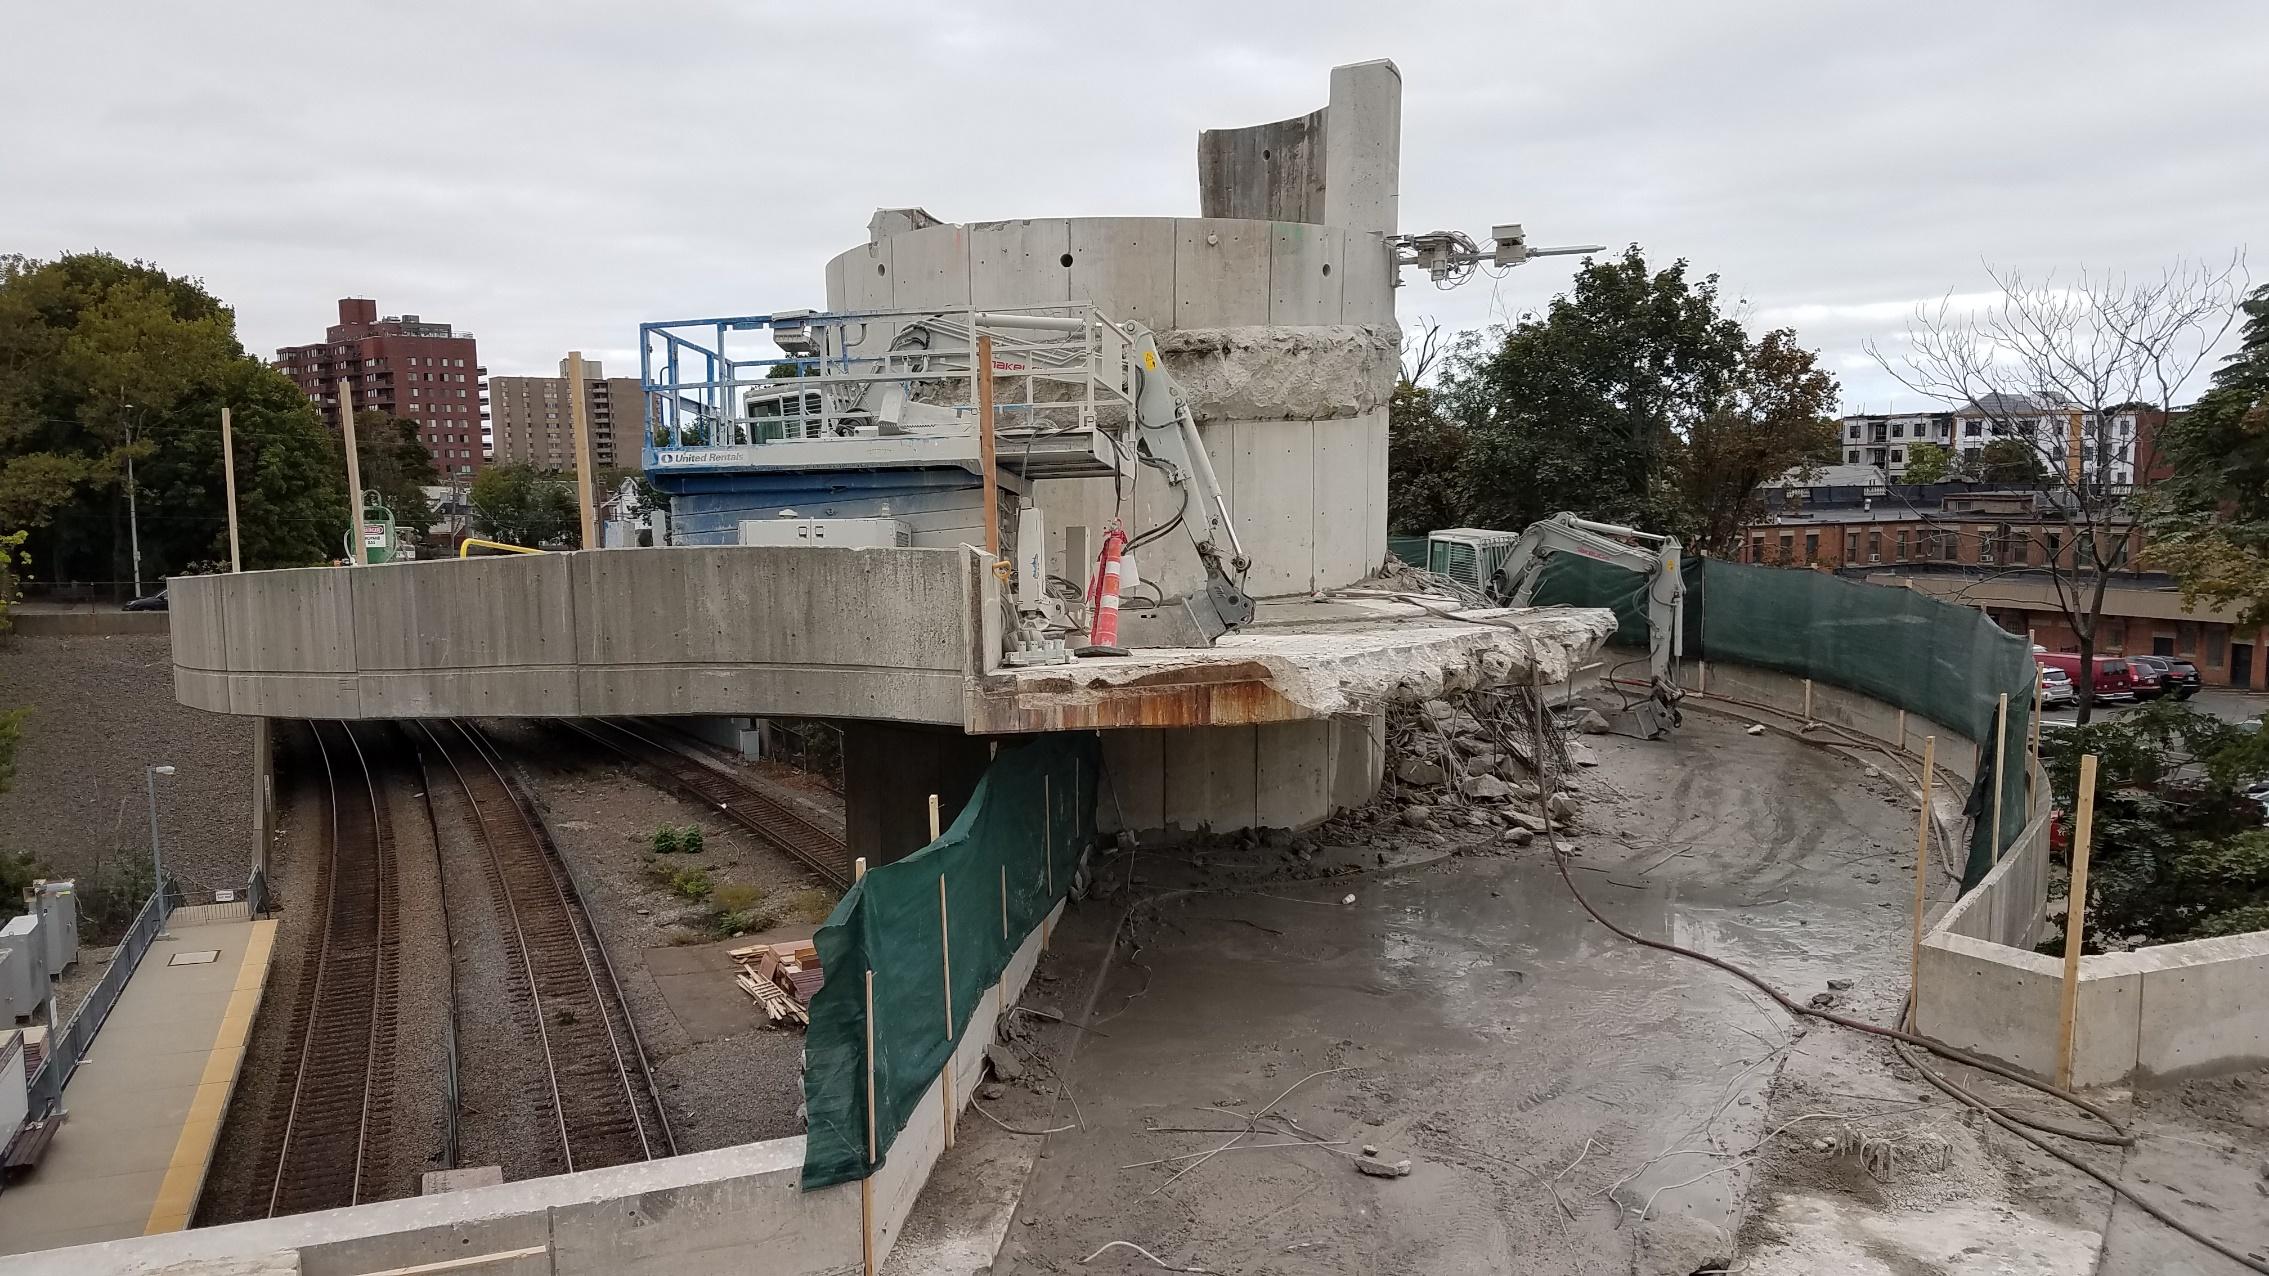 Demolition of helix ramp at Quincy Center garage (September 24, 2018)